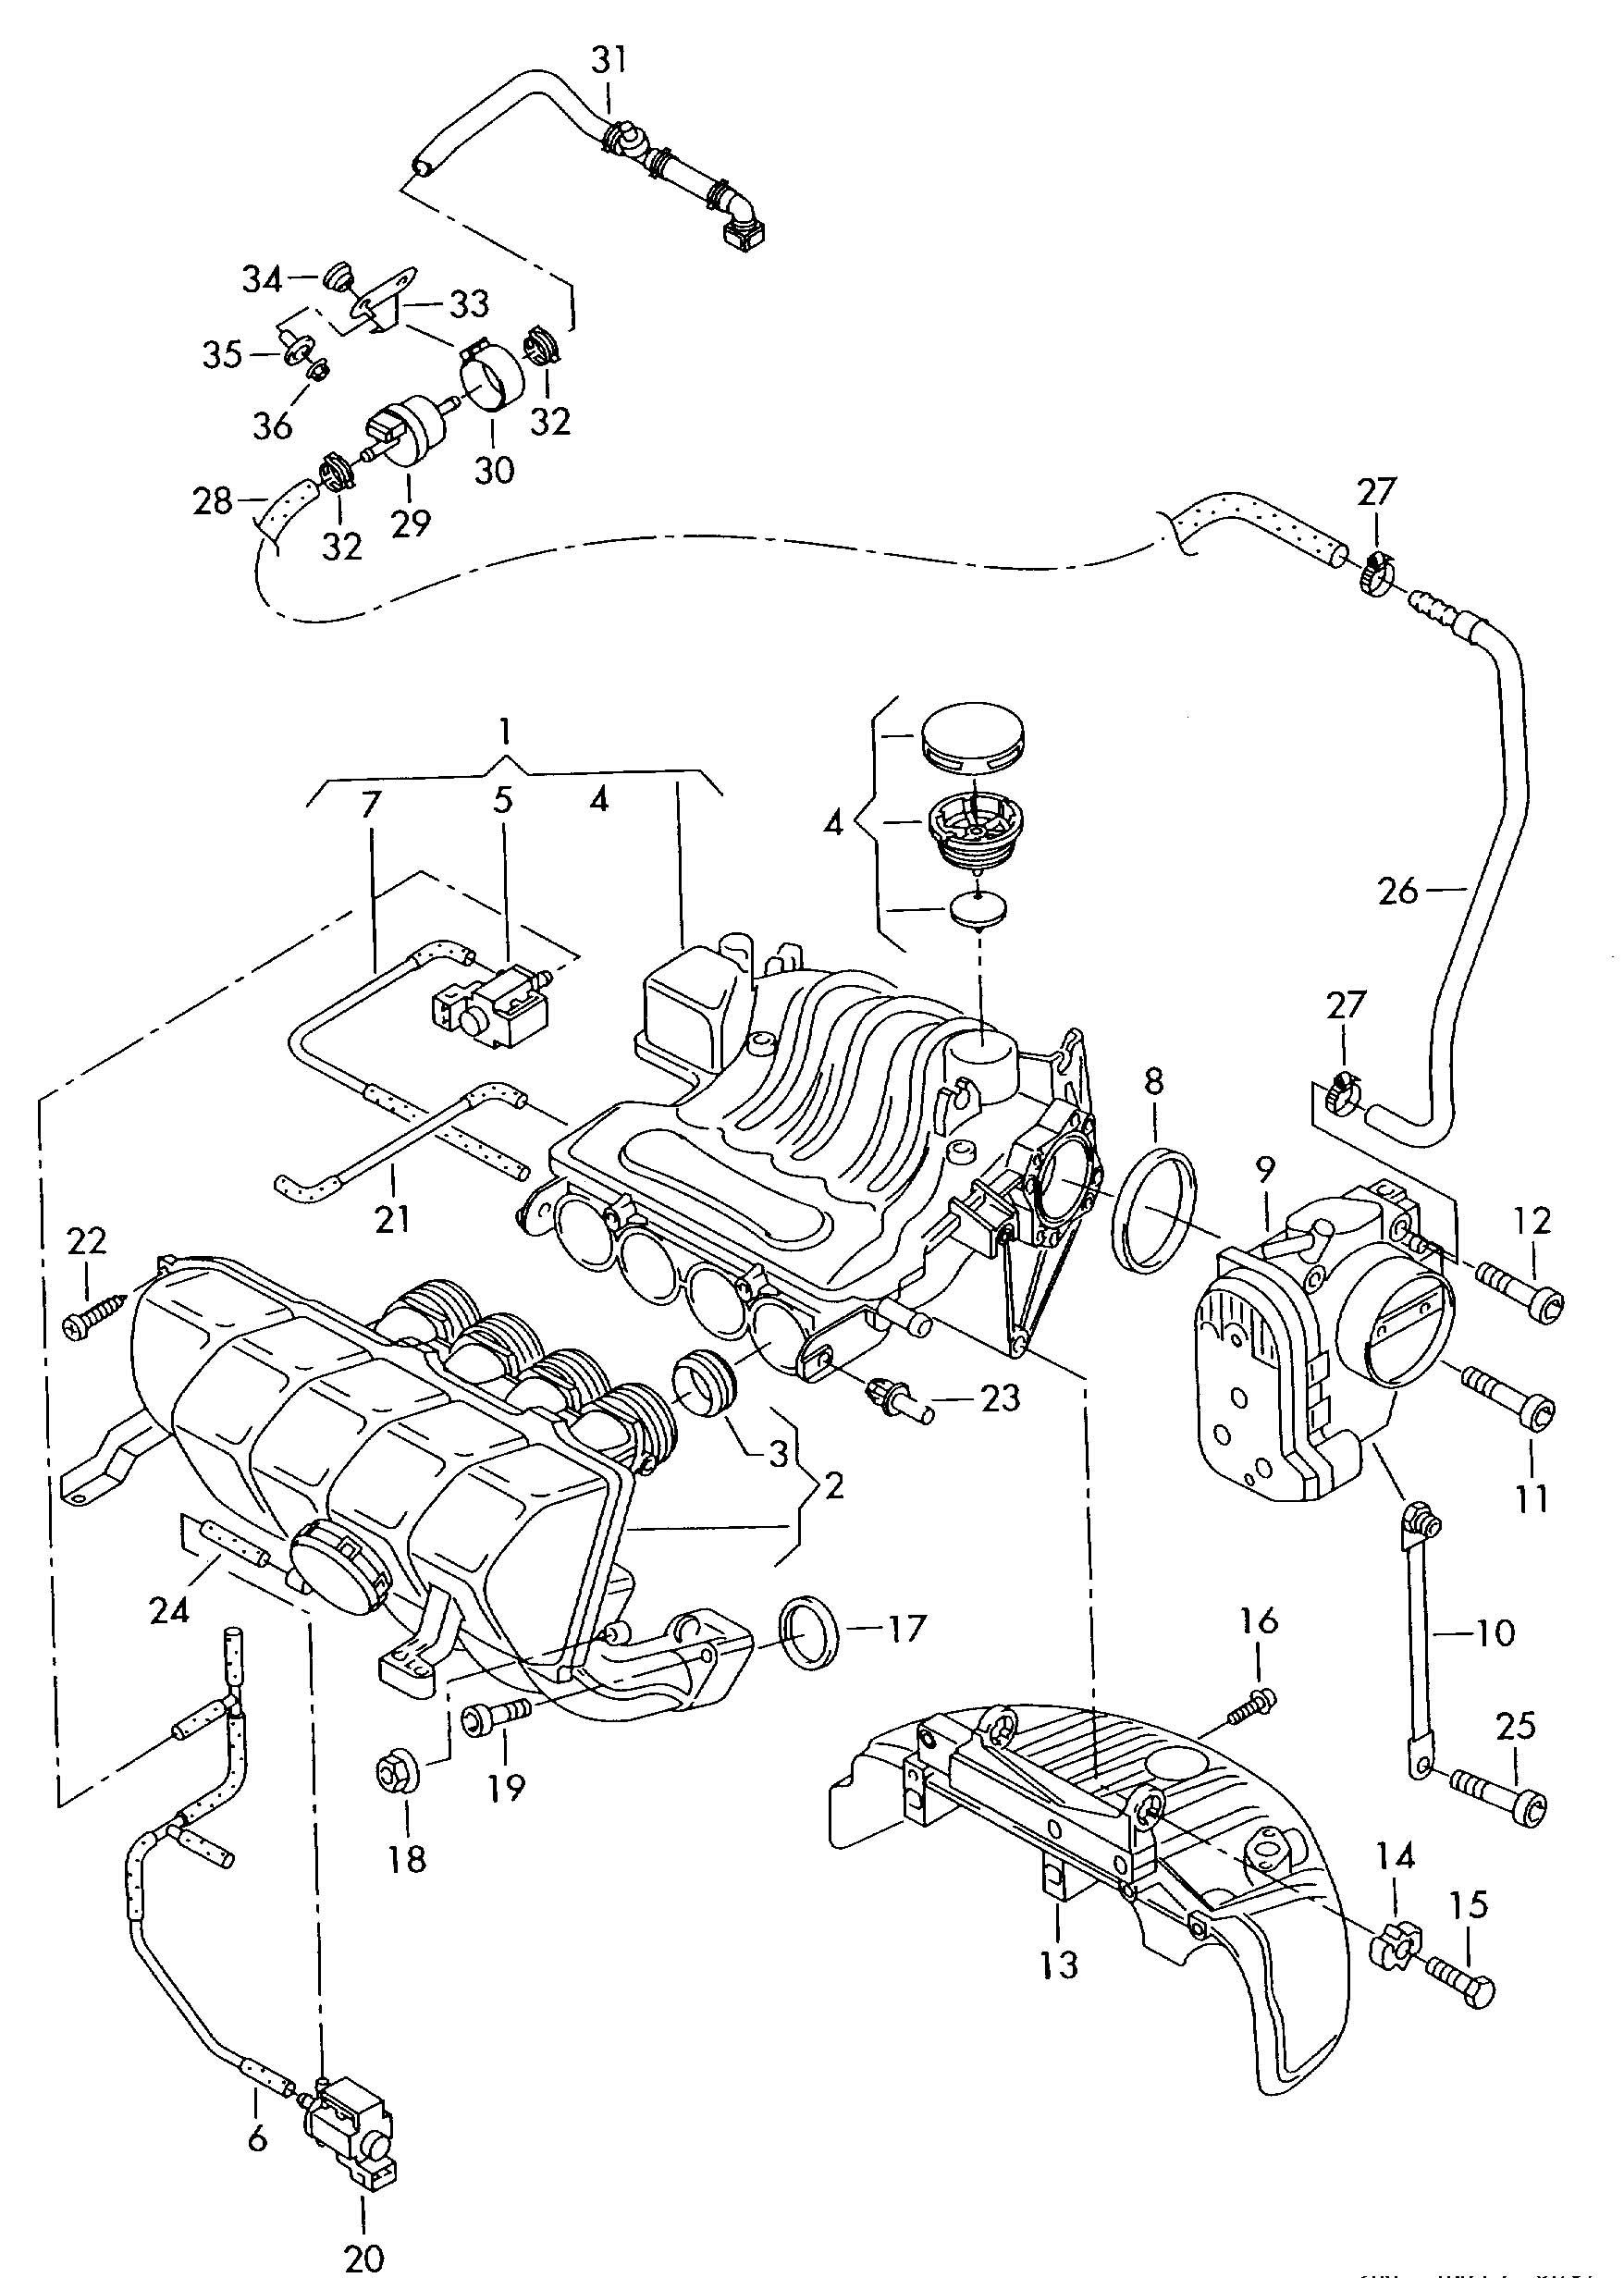 Vw Gti Engine Diagram